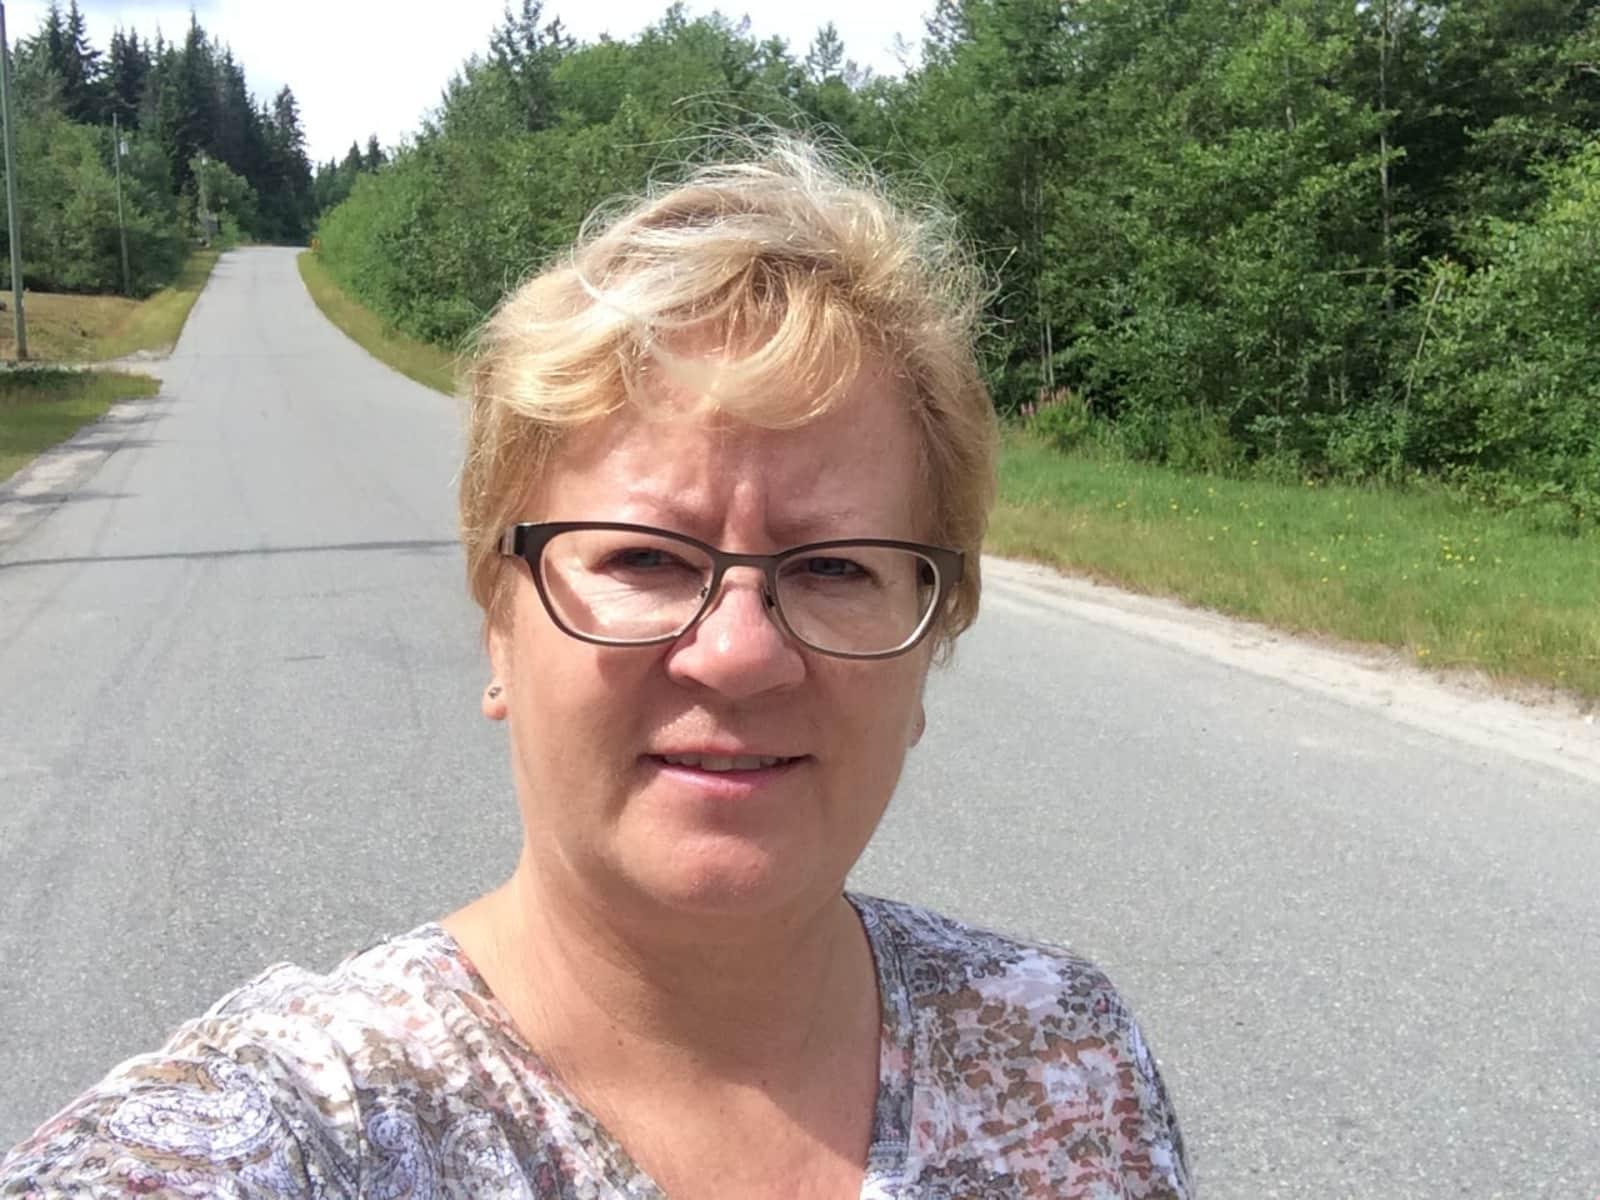 Lorrie from Calgary, Alberta, Canada